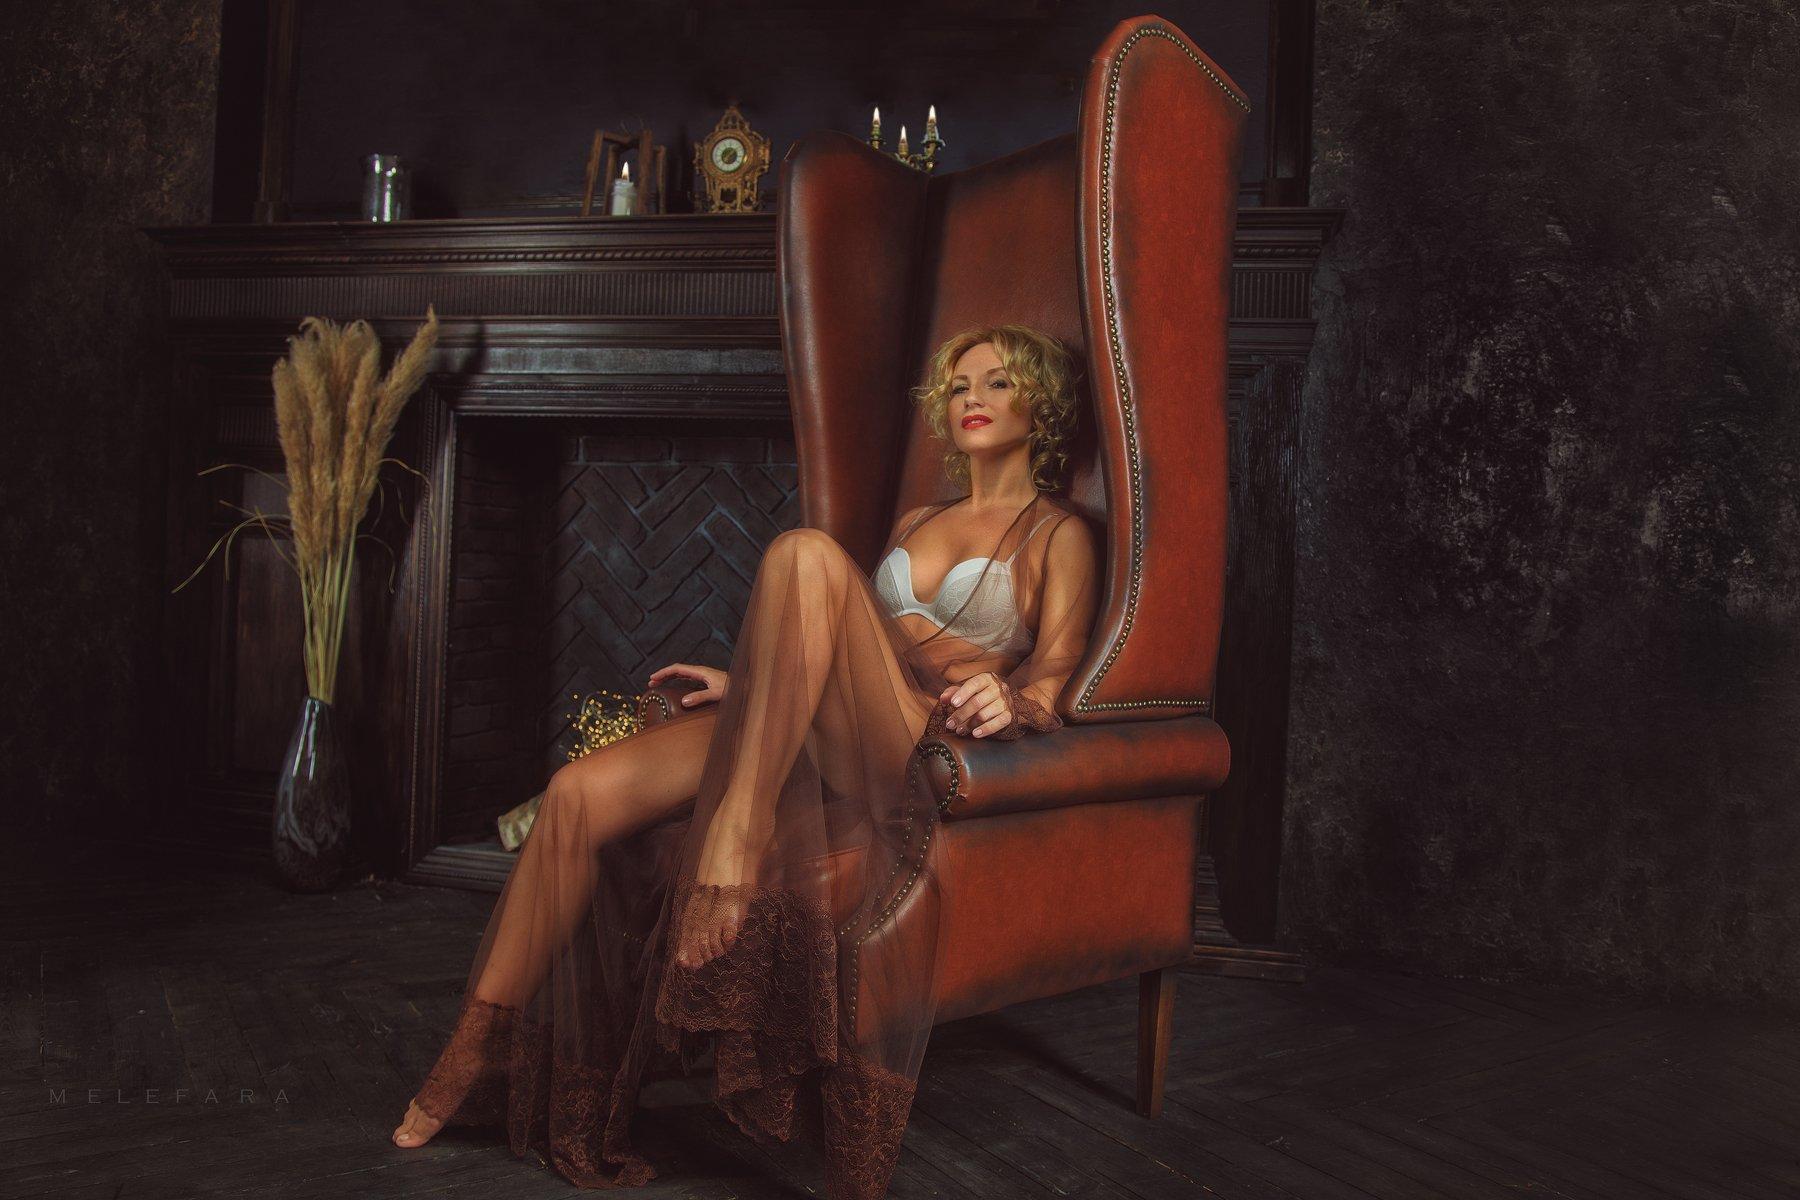 chair, beautiful, girl, woman, Сергей Мелефара